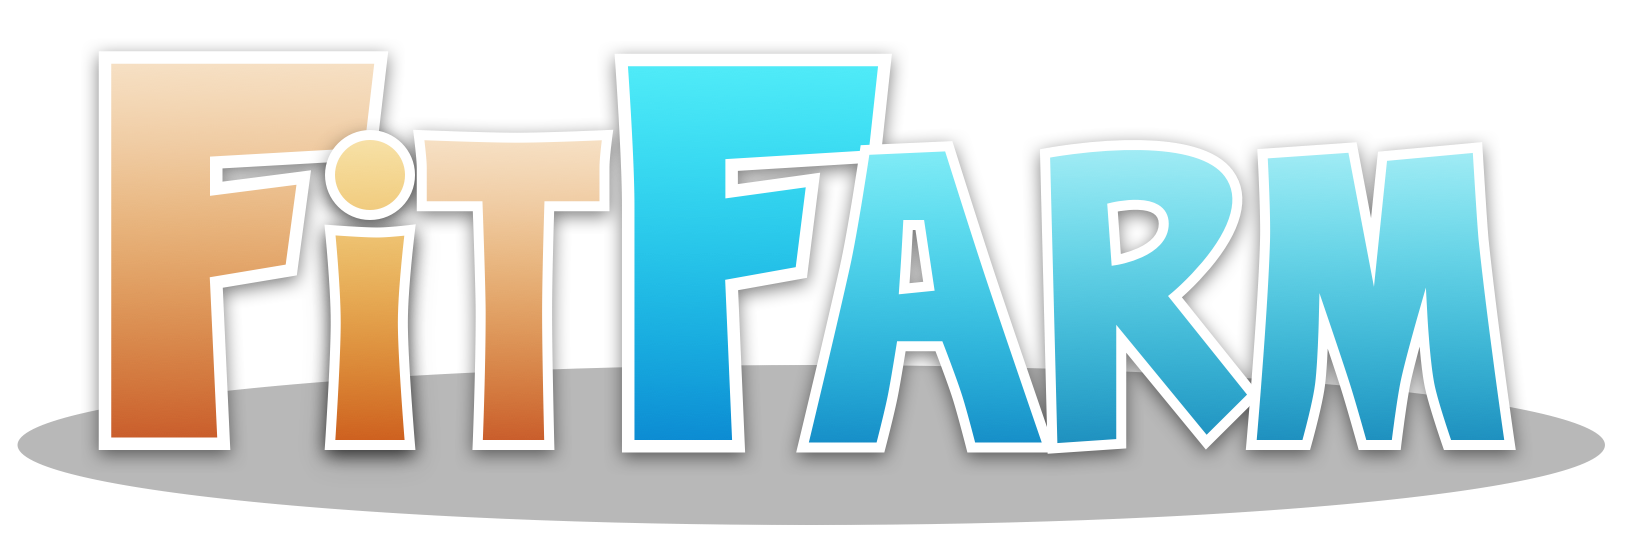 FitFarm: A Fitness-Based Farm Management Simulator